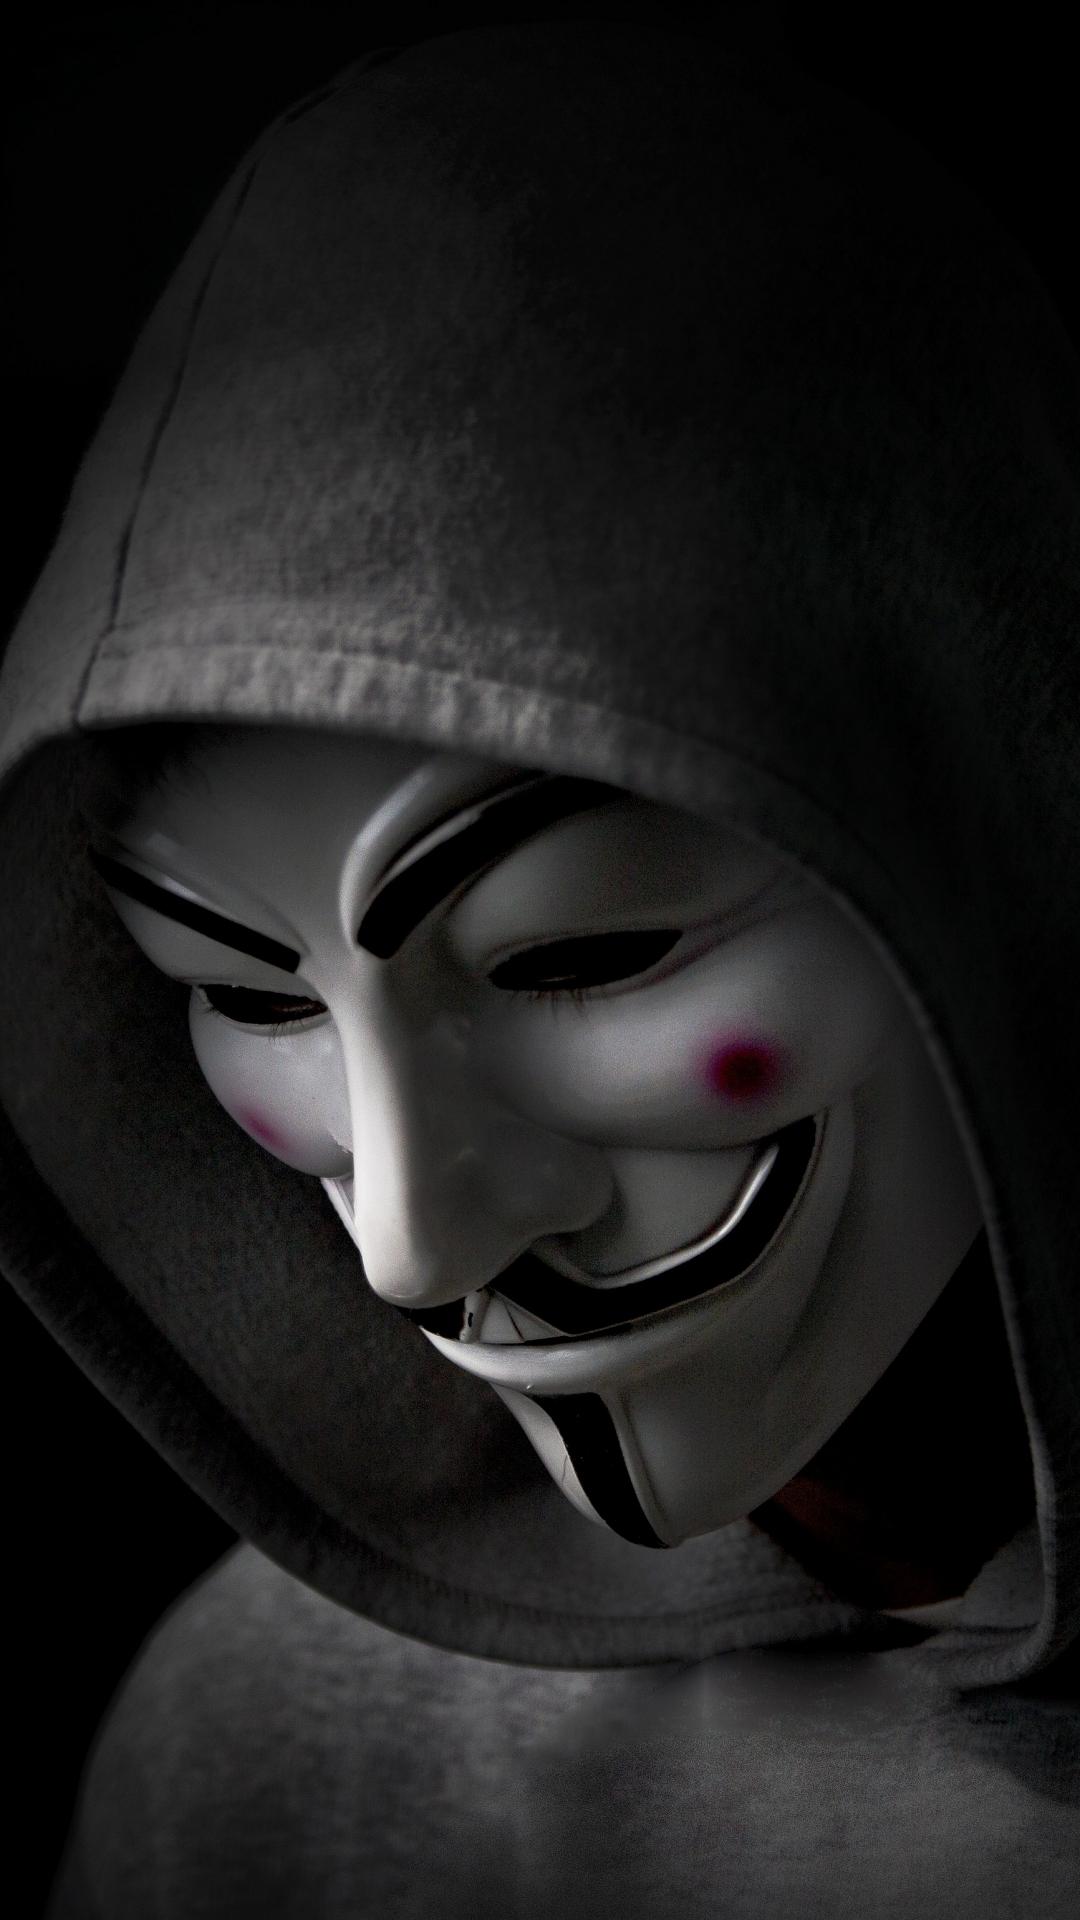 Happy Quotes Wallpaper Iphone Anonymous Wallpaper Hd For Iphone Pixelstalk Net